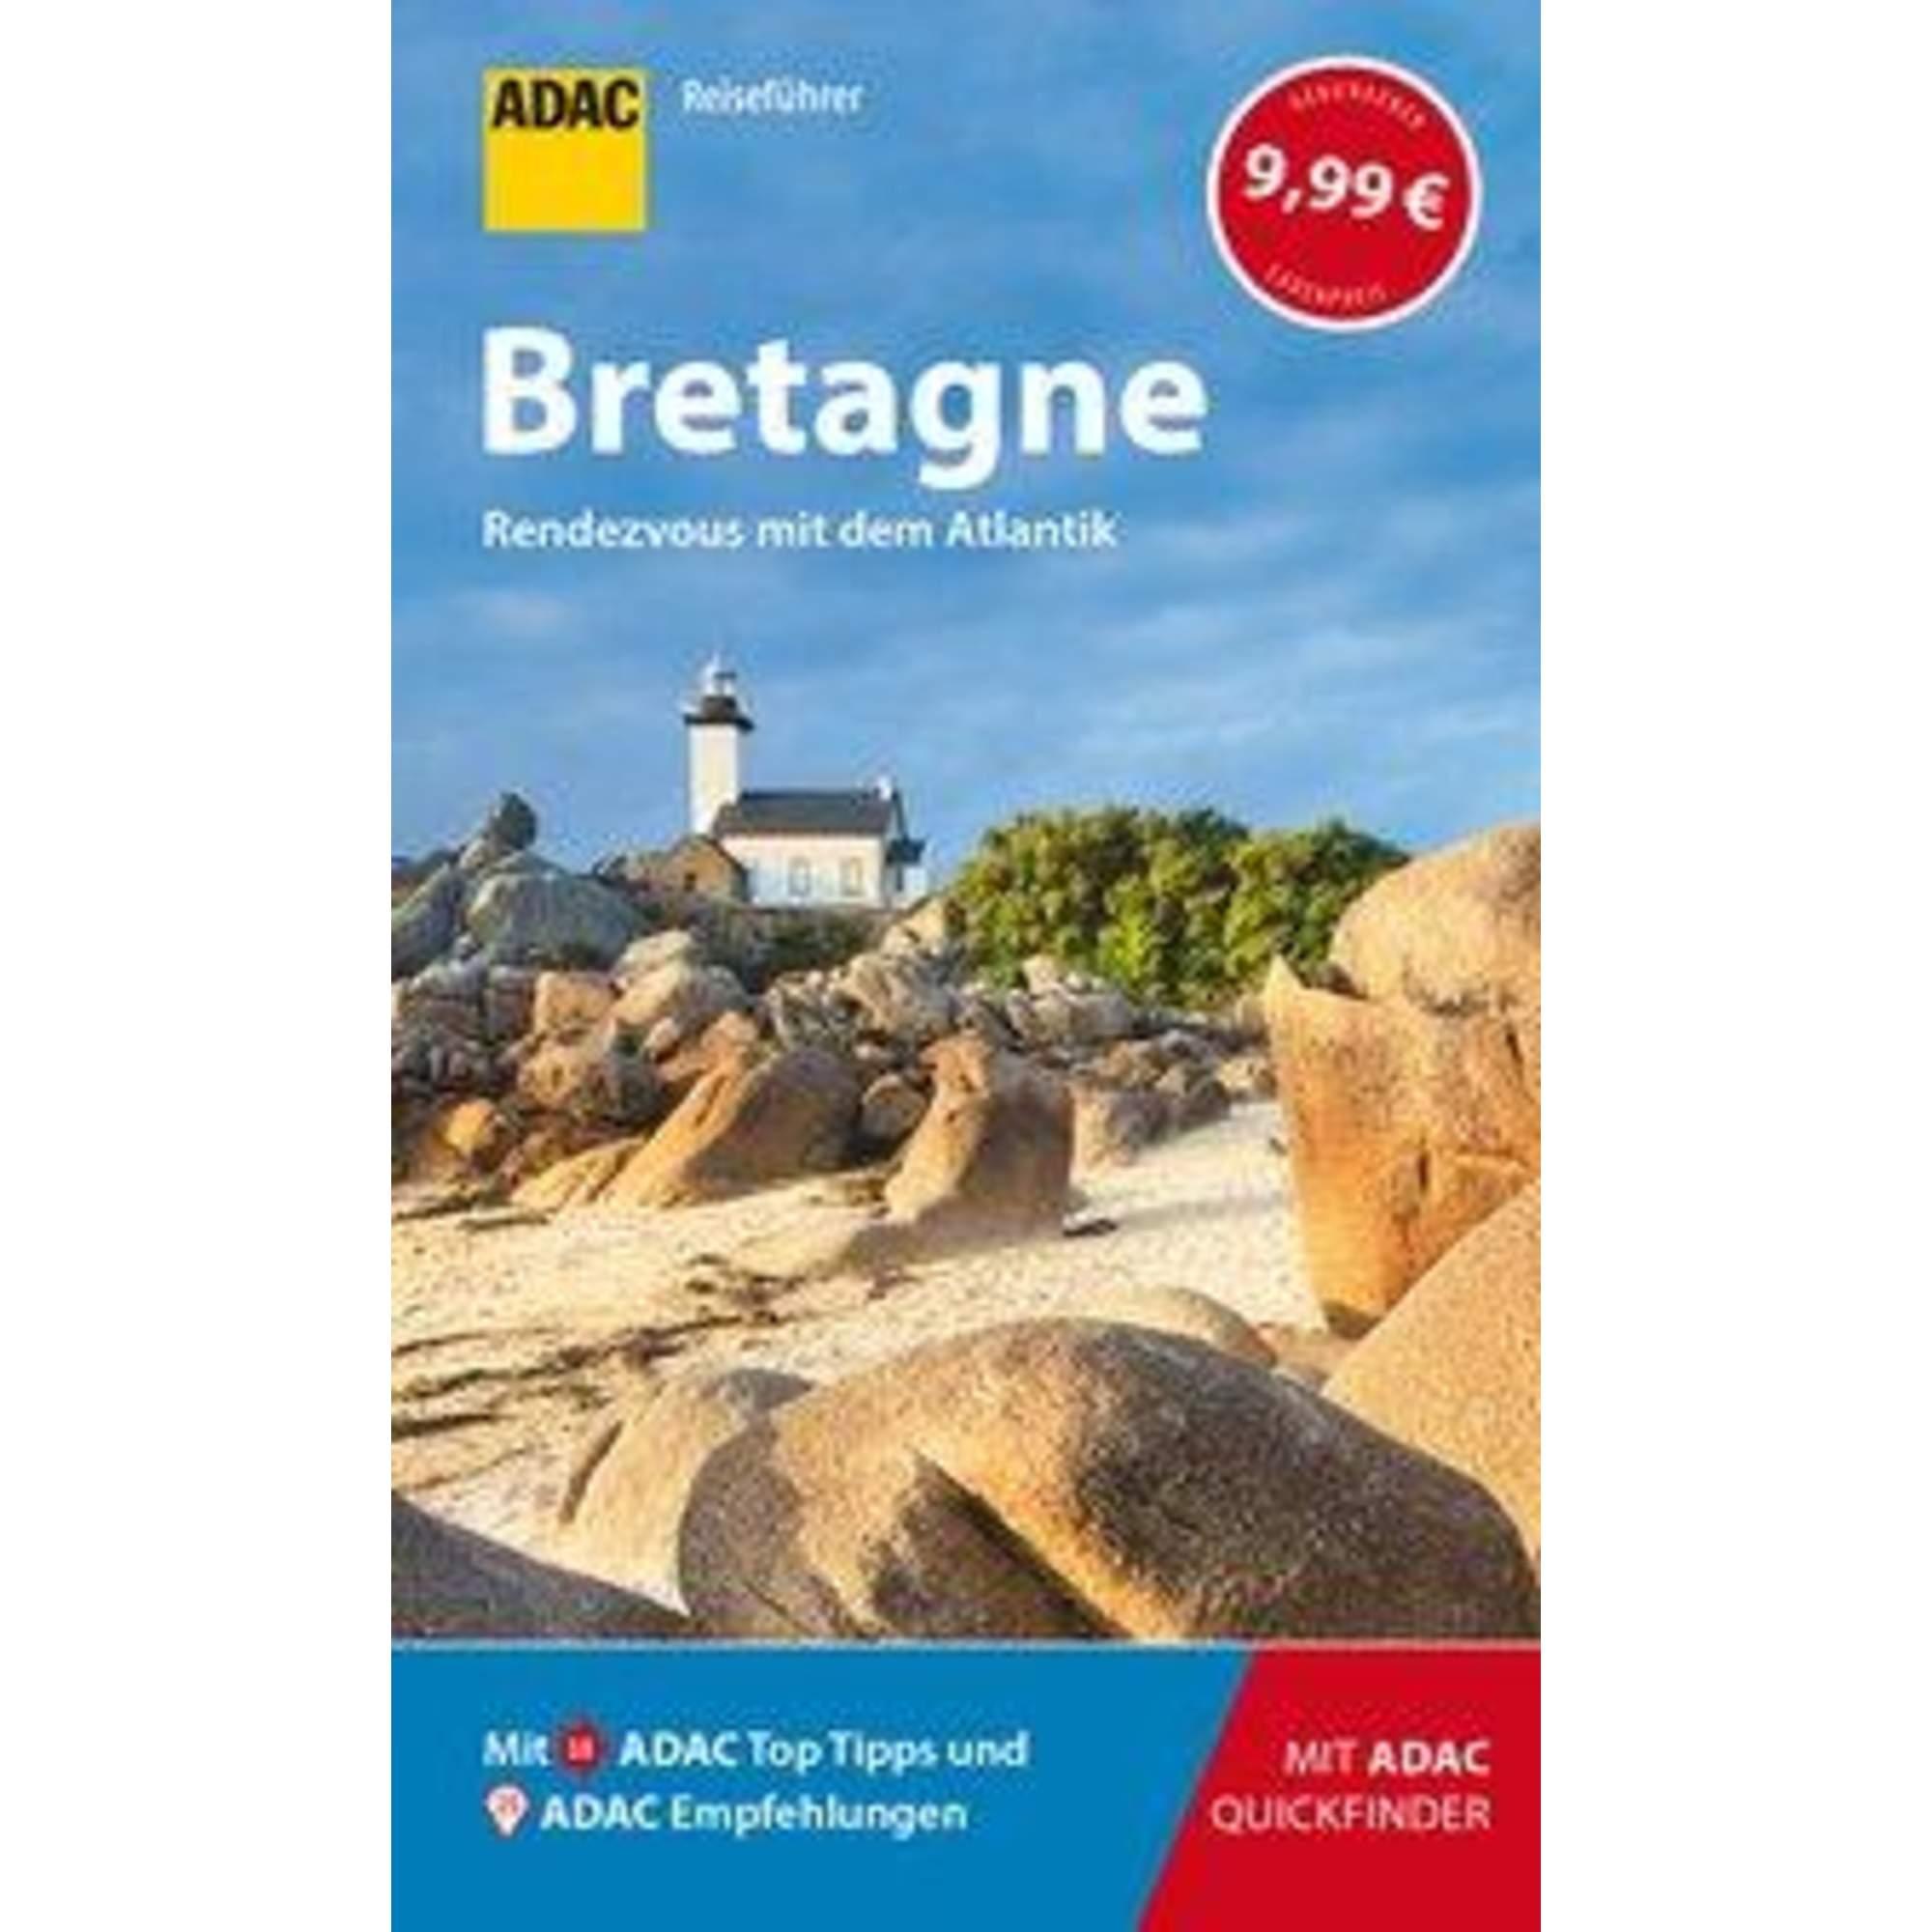 ADAC Reiseführer Bretagne, 9,99 Euro